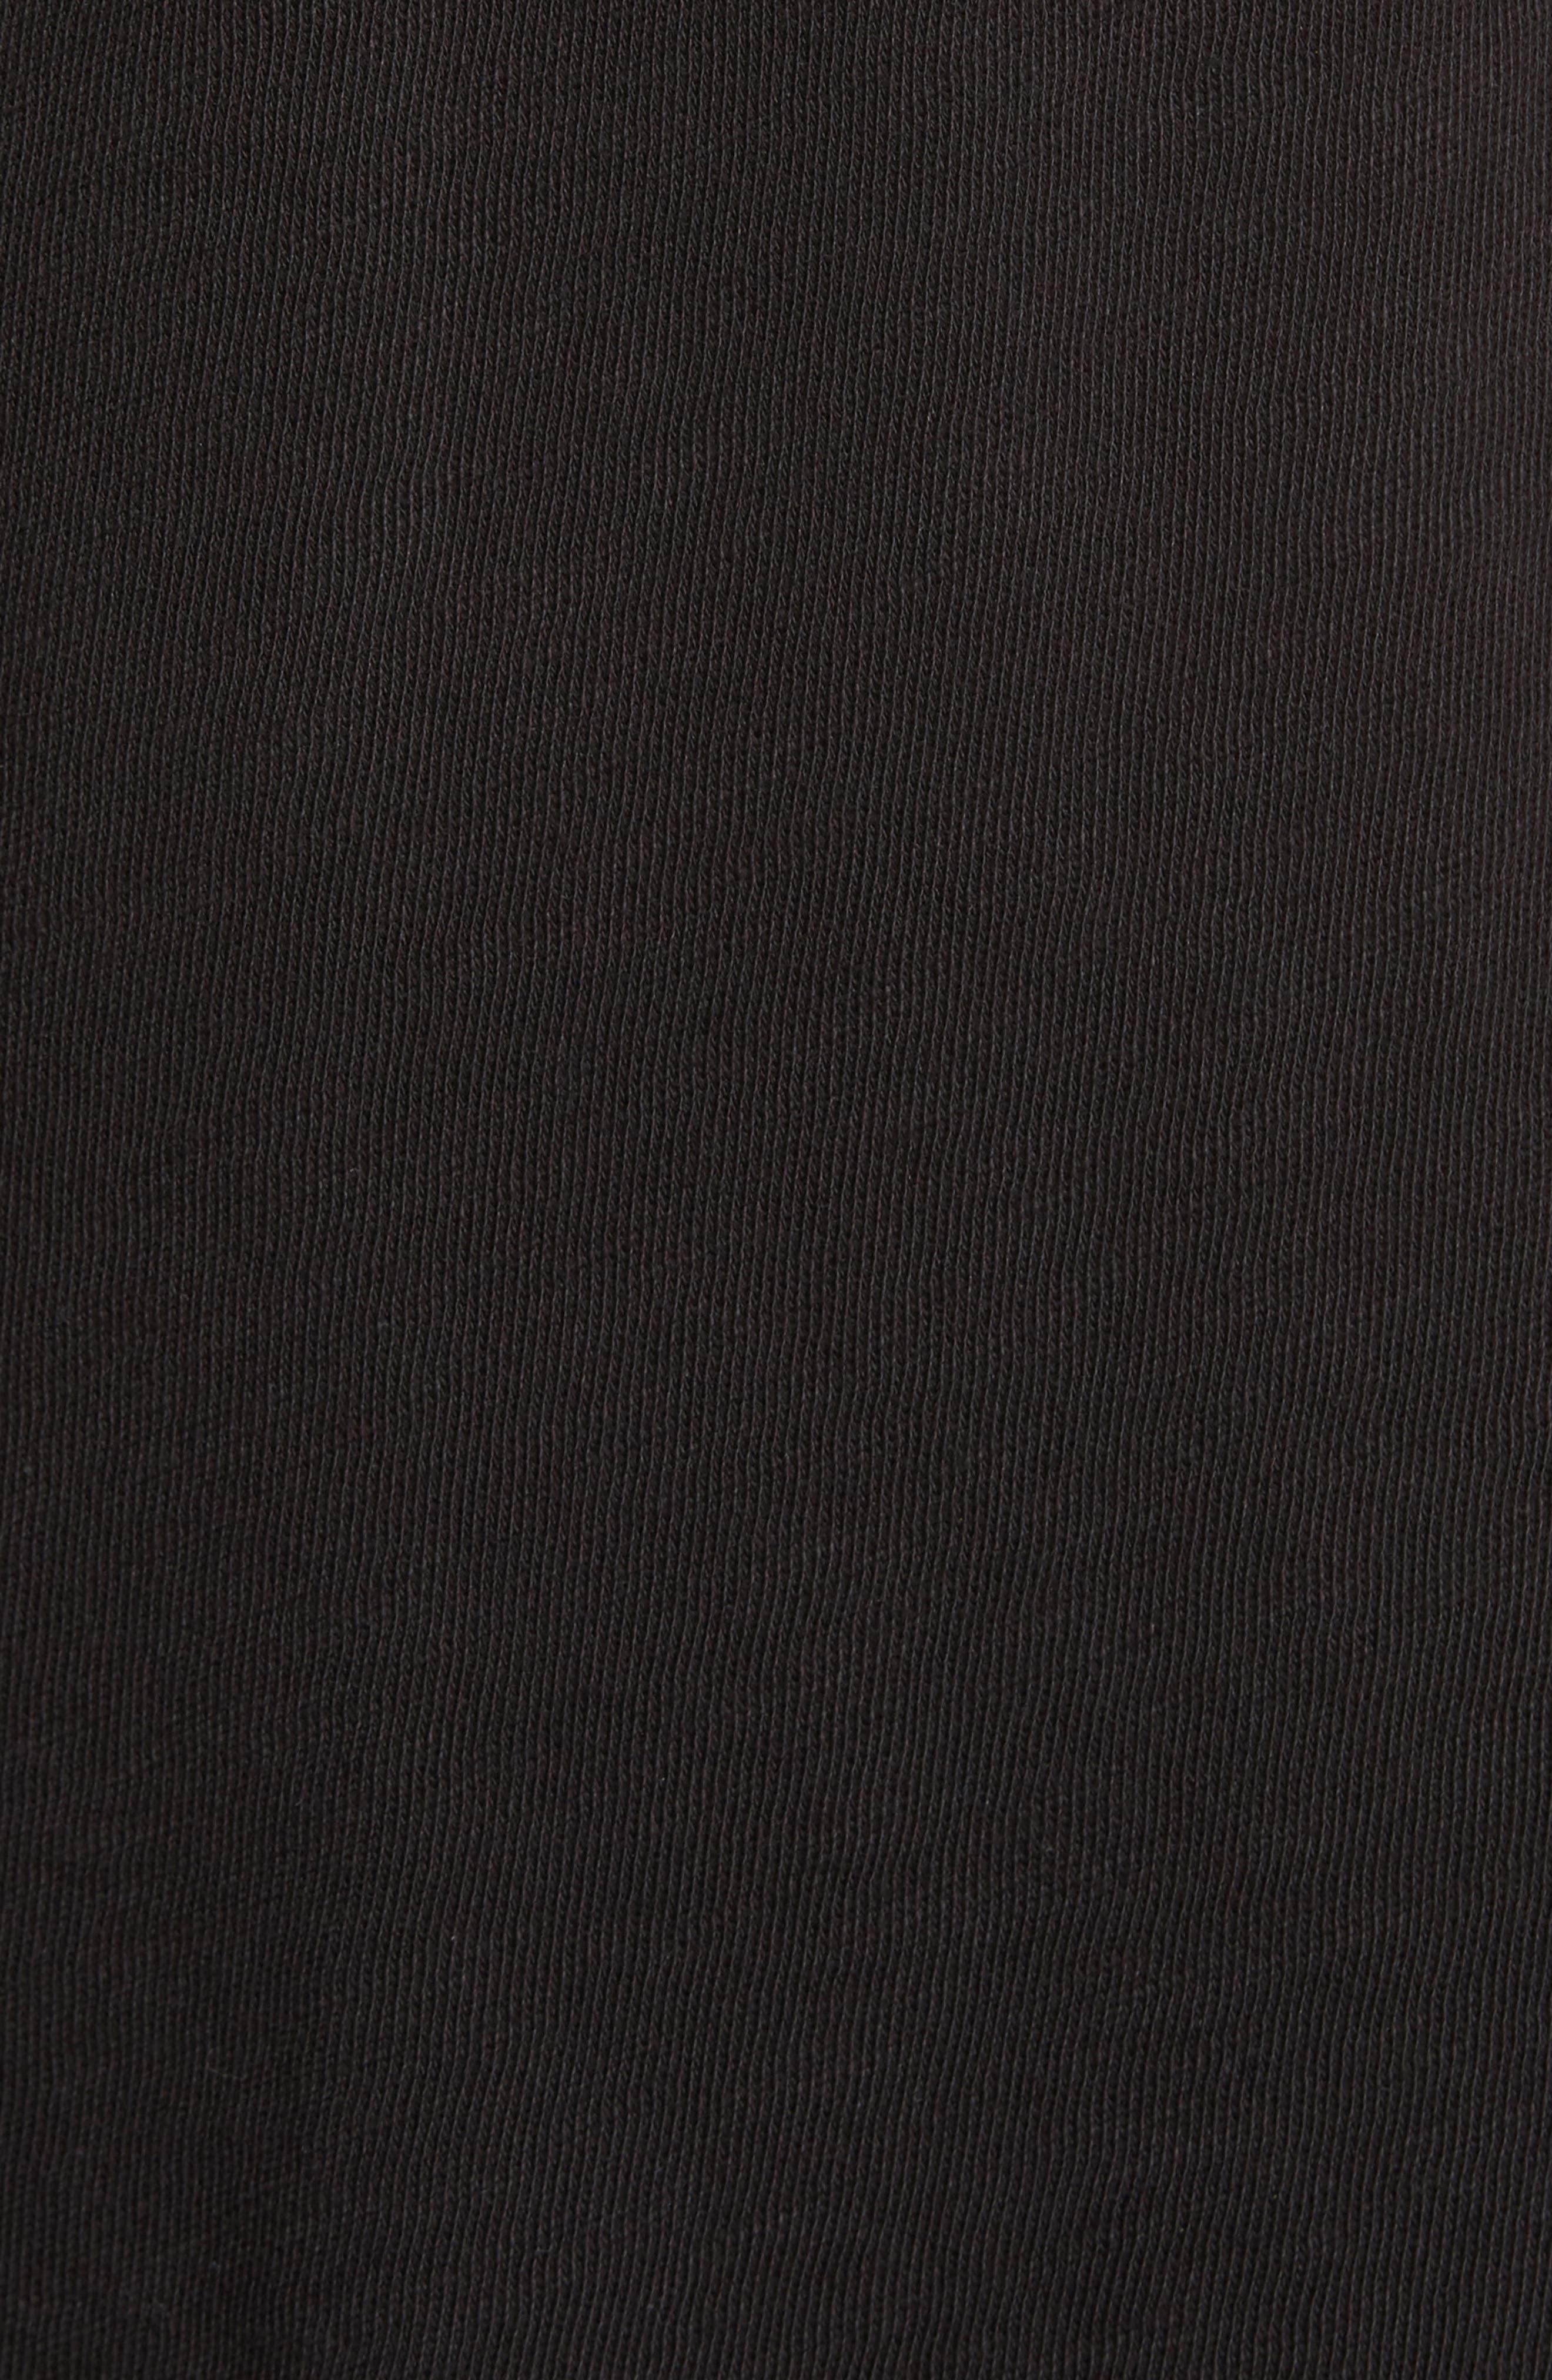 Denim Goods T-Shirt,                             Alternate thumbnail 5, color,                             Black